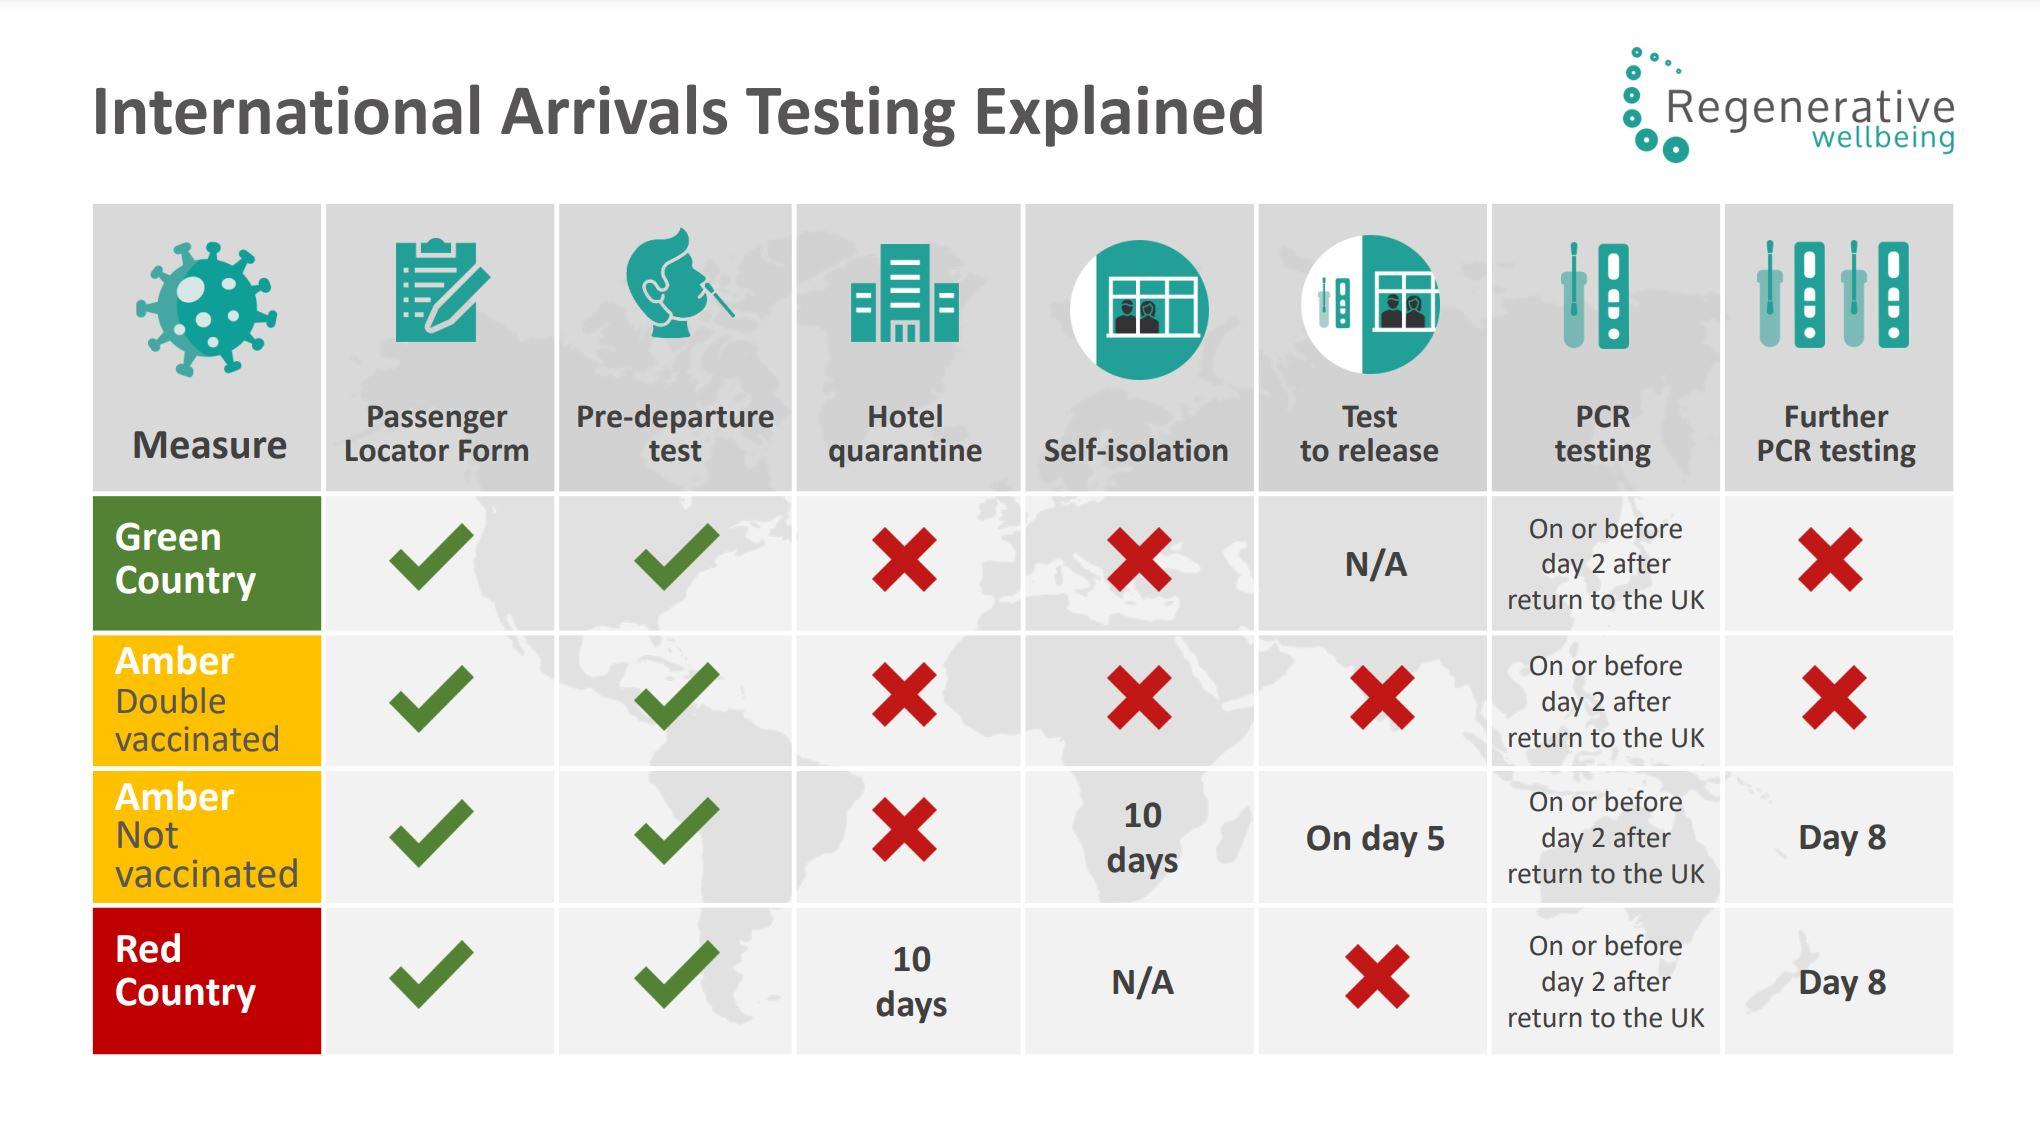 International Arrivals Explained